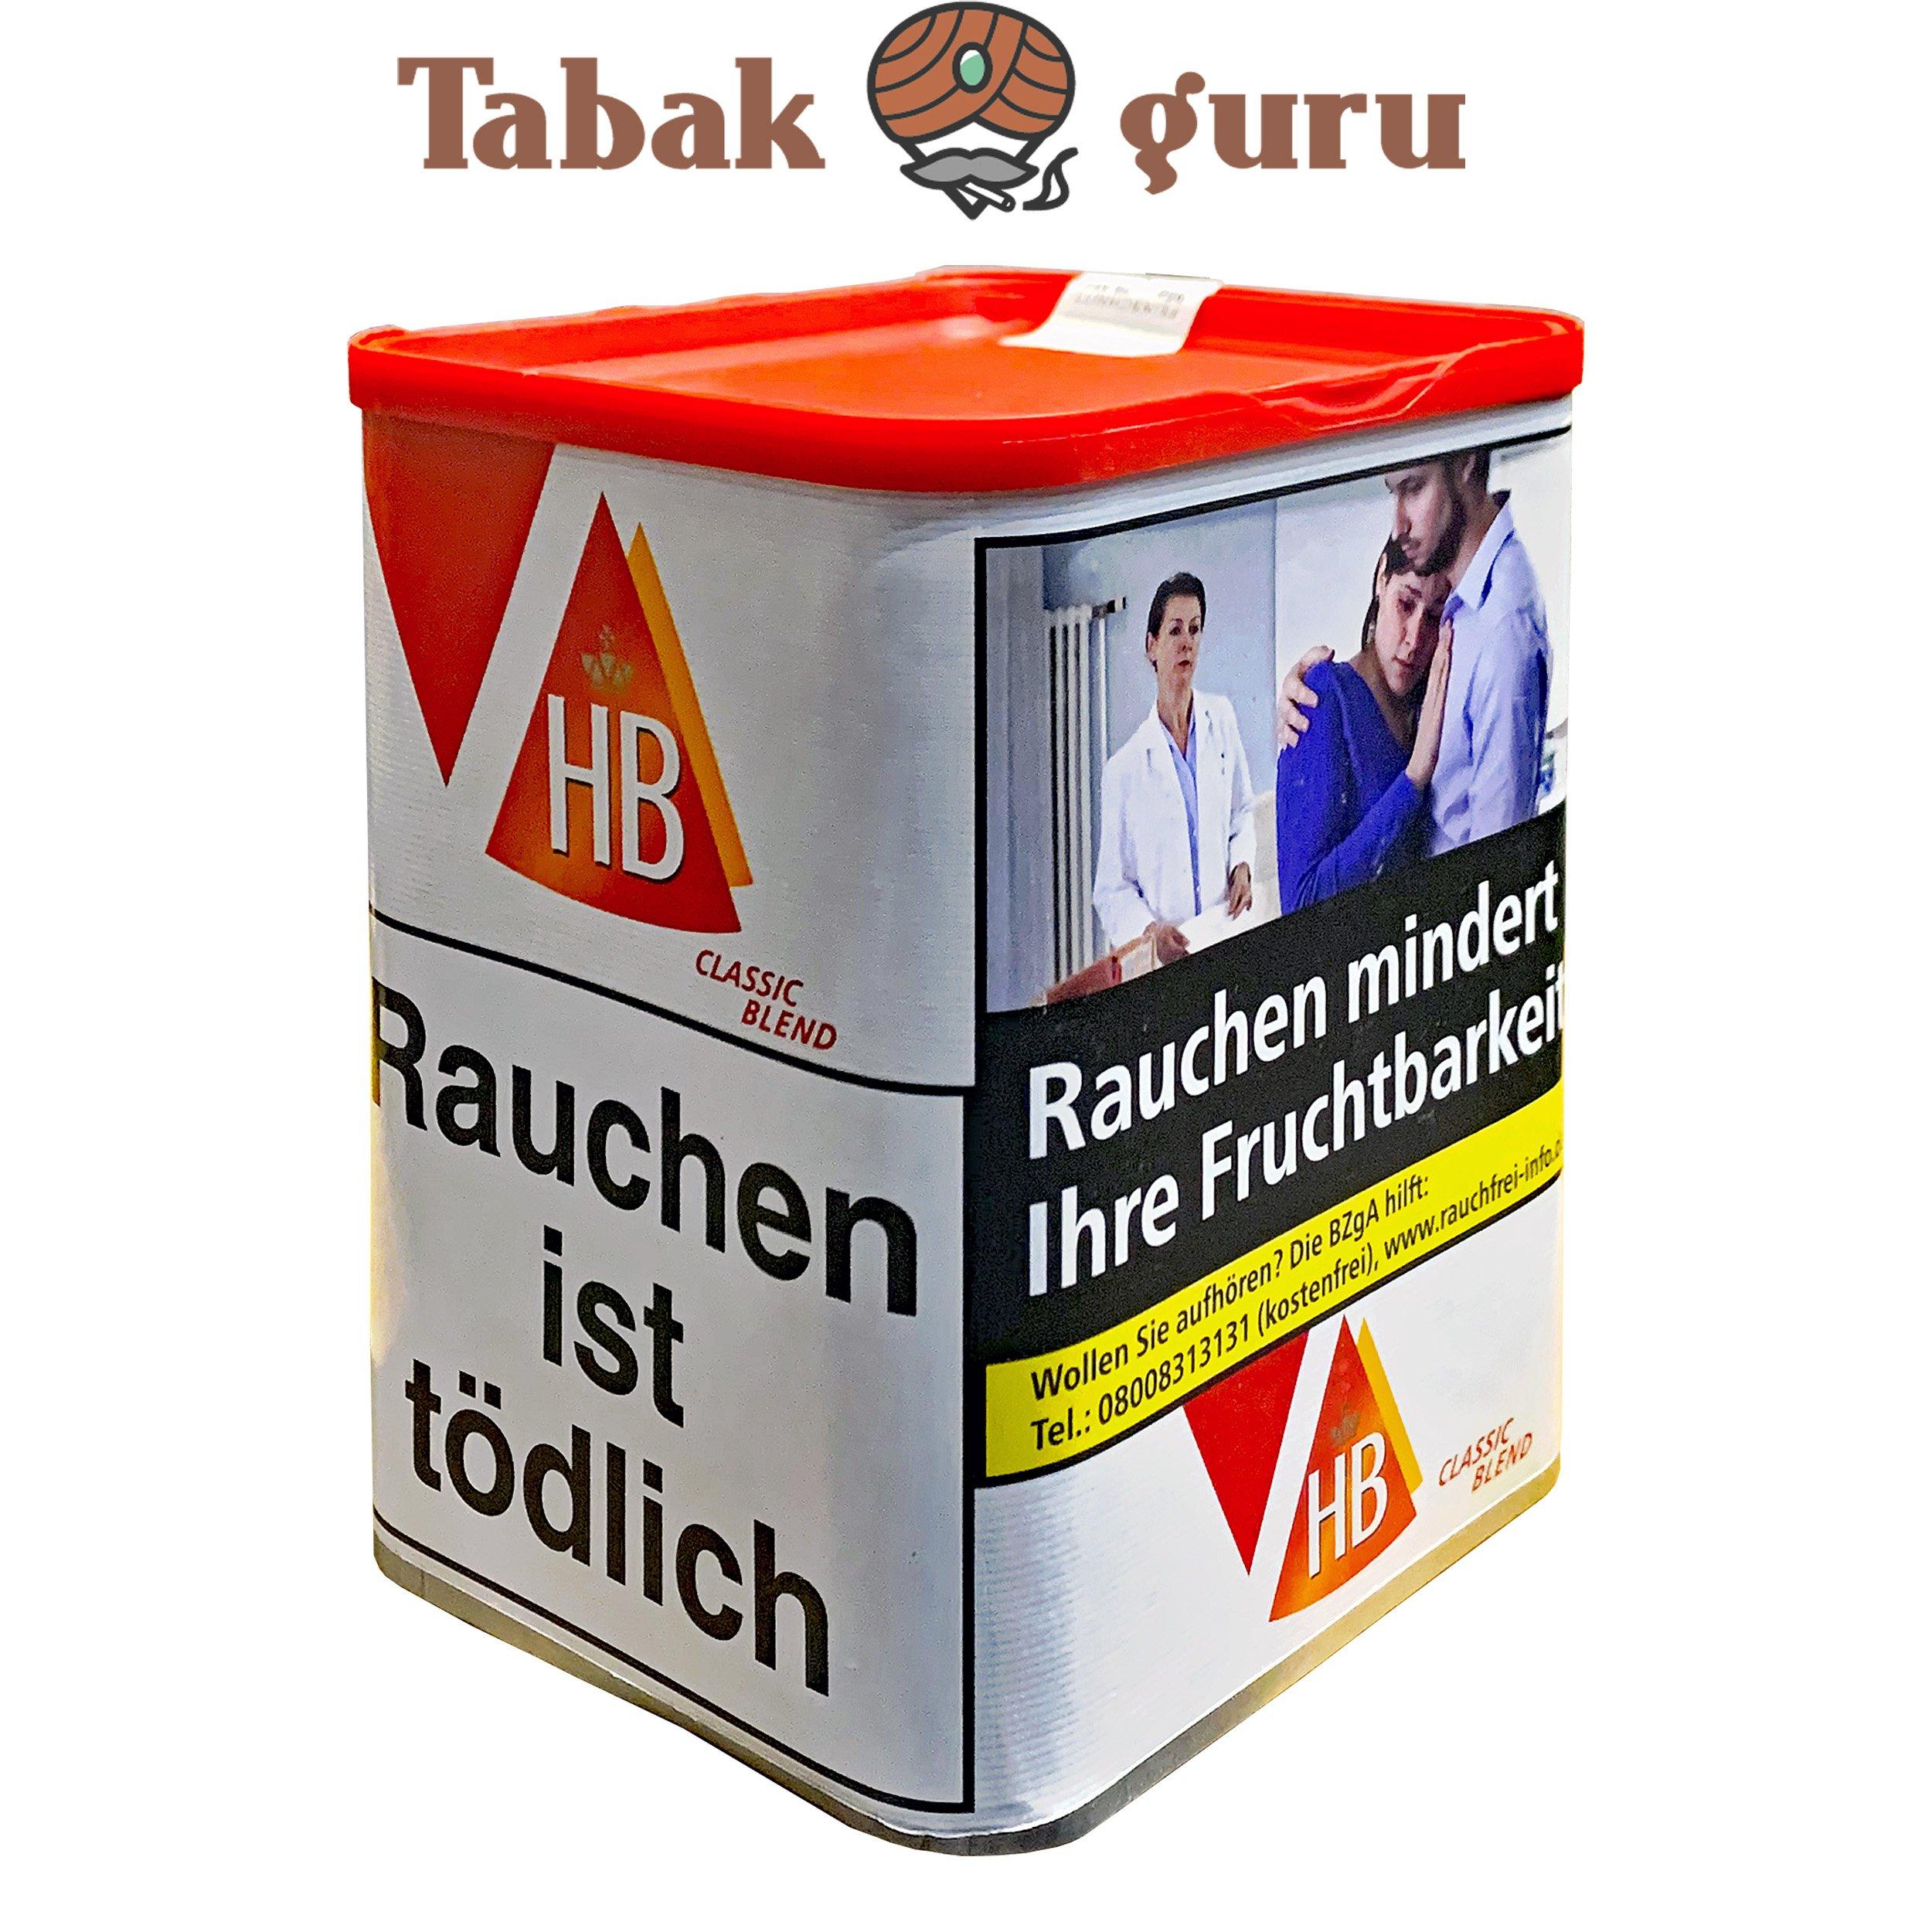 HB Quality Blend / Classic Blend Zigarettentabak 85 g Dose